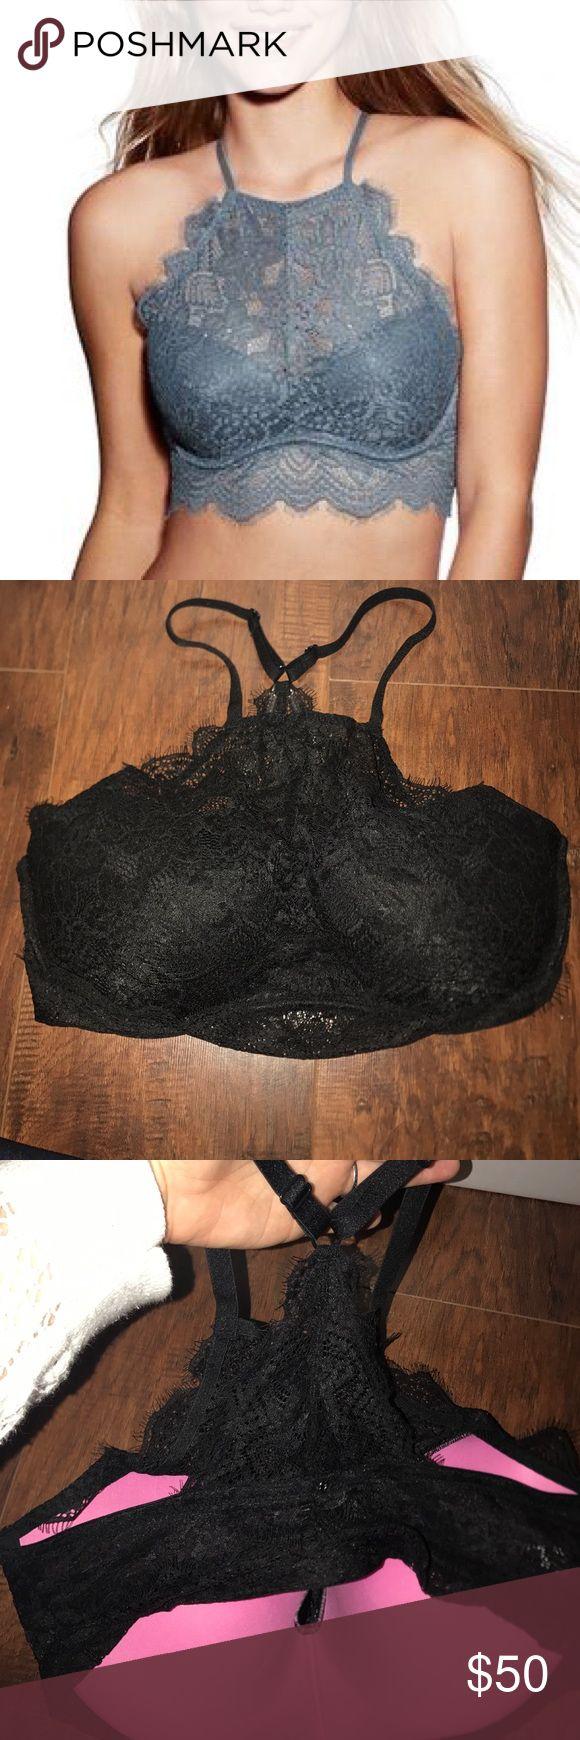 Victoria secret PINK bralette NWOT. Size large.  Black.  Never worn. PINK Victoria's Secret Intimates & Sleepwear Bras